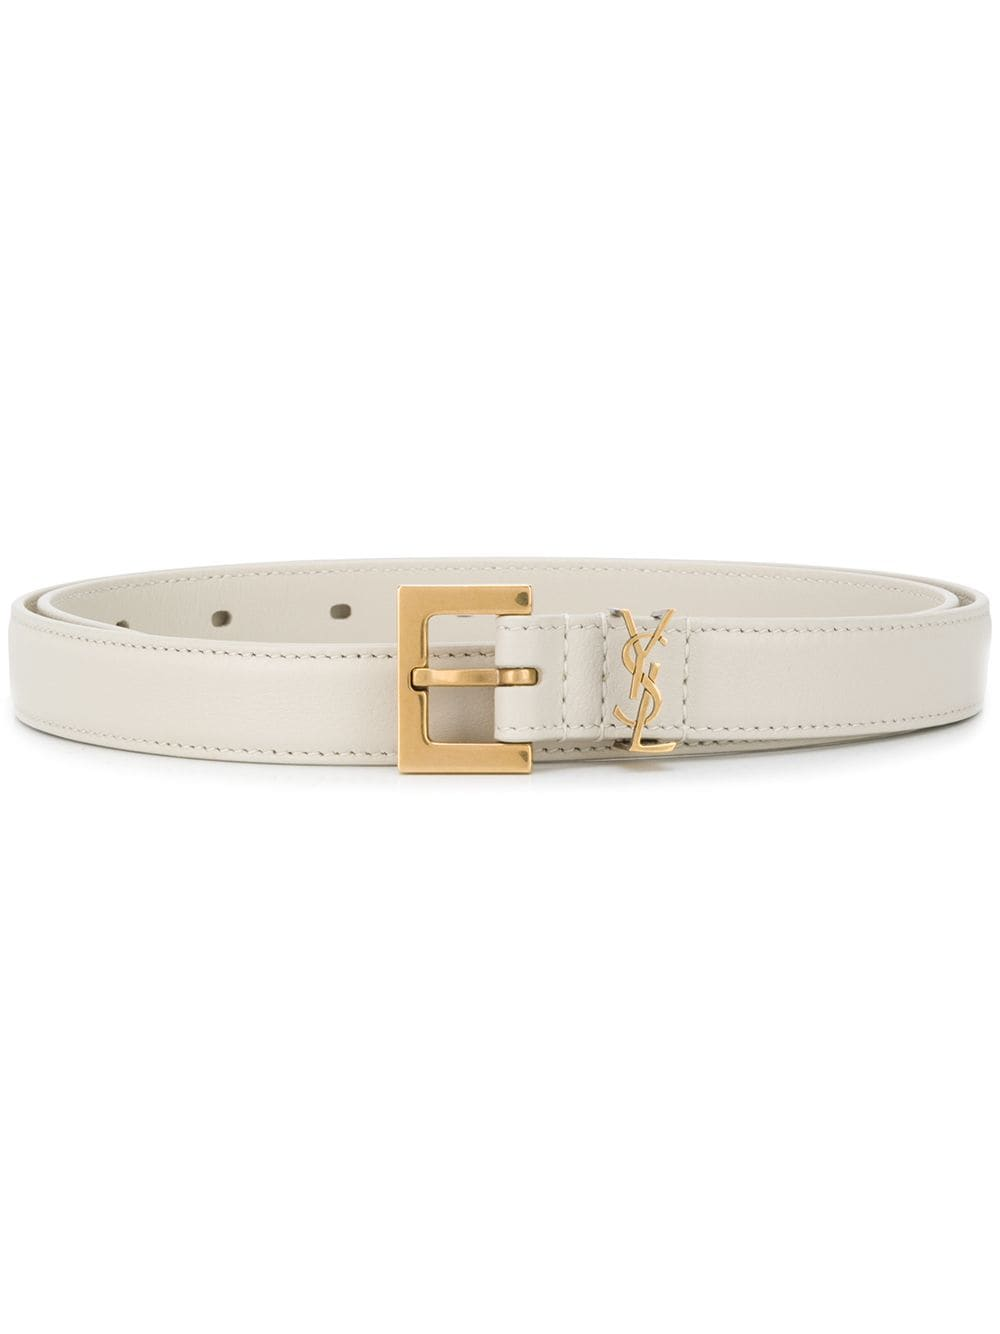 Picture of Saint Laurent | Monogram Leather Belt